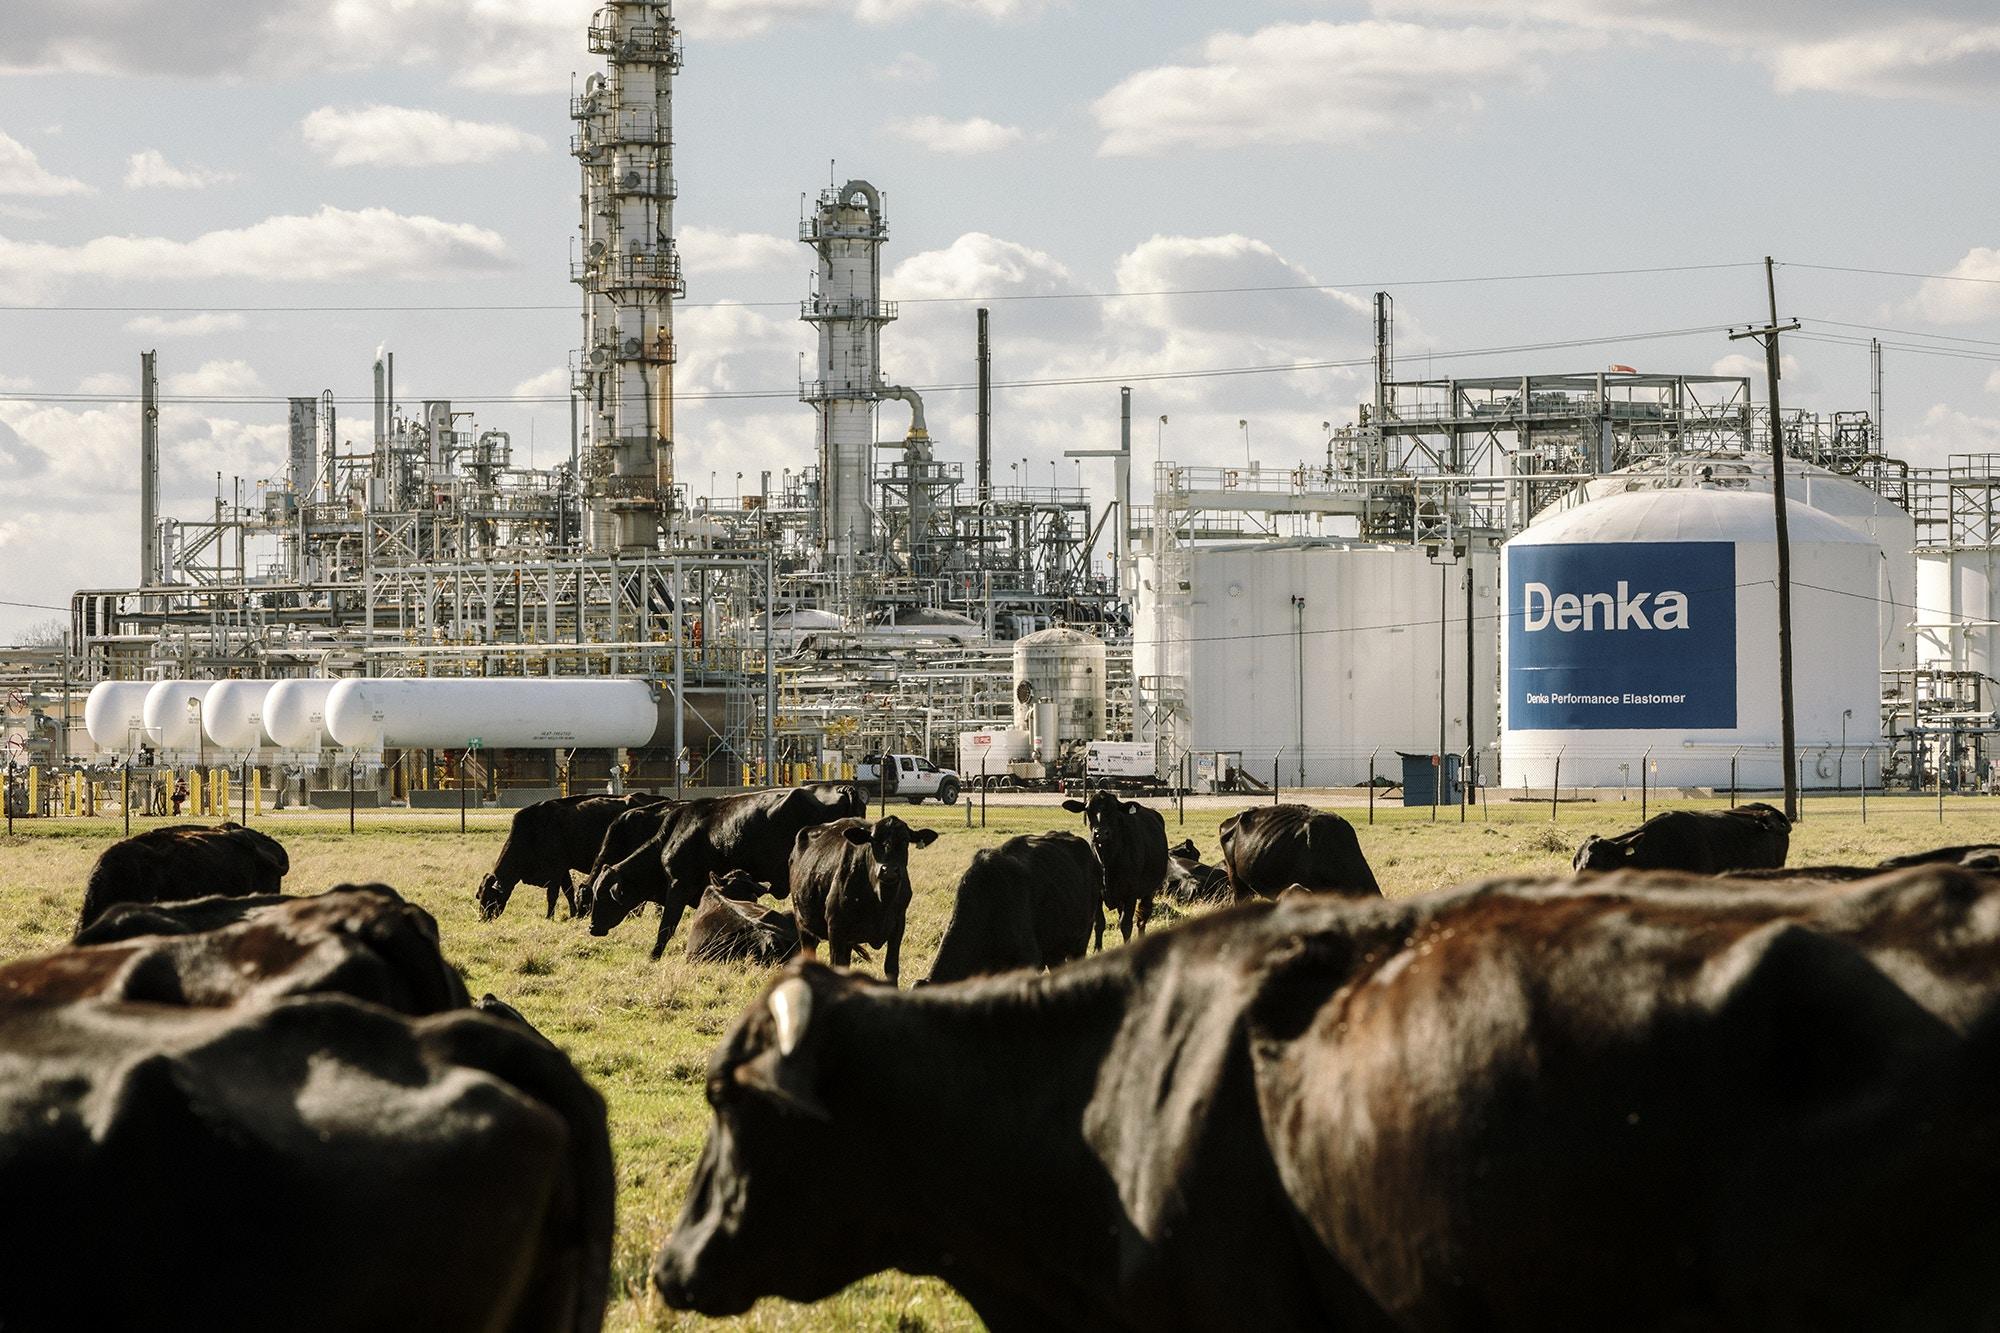 Reserve, LA - Feb 24, 2017 - Cows graze on land bordering the Dupont/Denka plant.